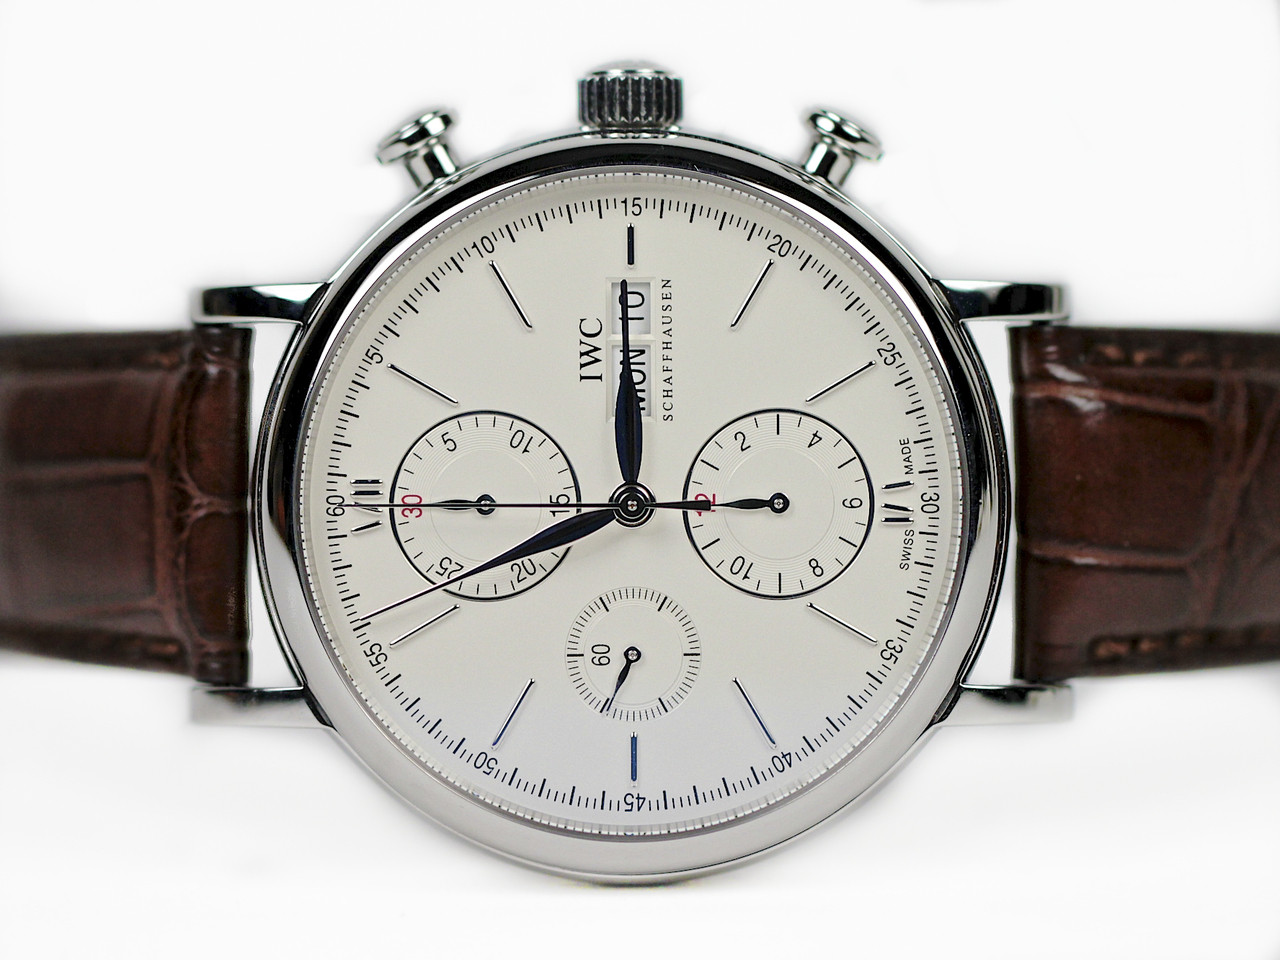 new arrivals c0ca1 26daa IWC Watch - Portofino Silver Dial Chronograph IW391007